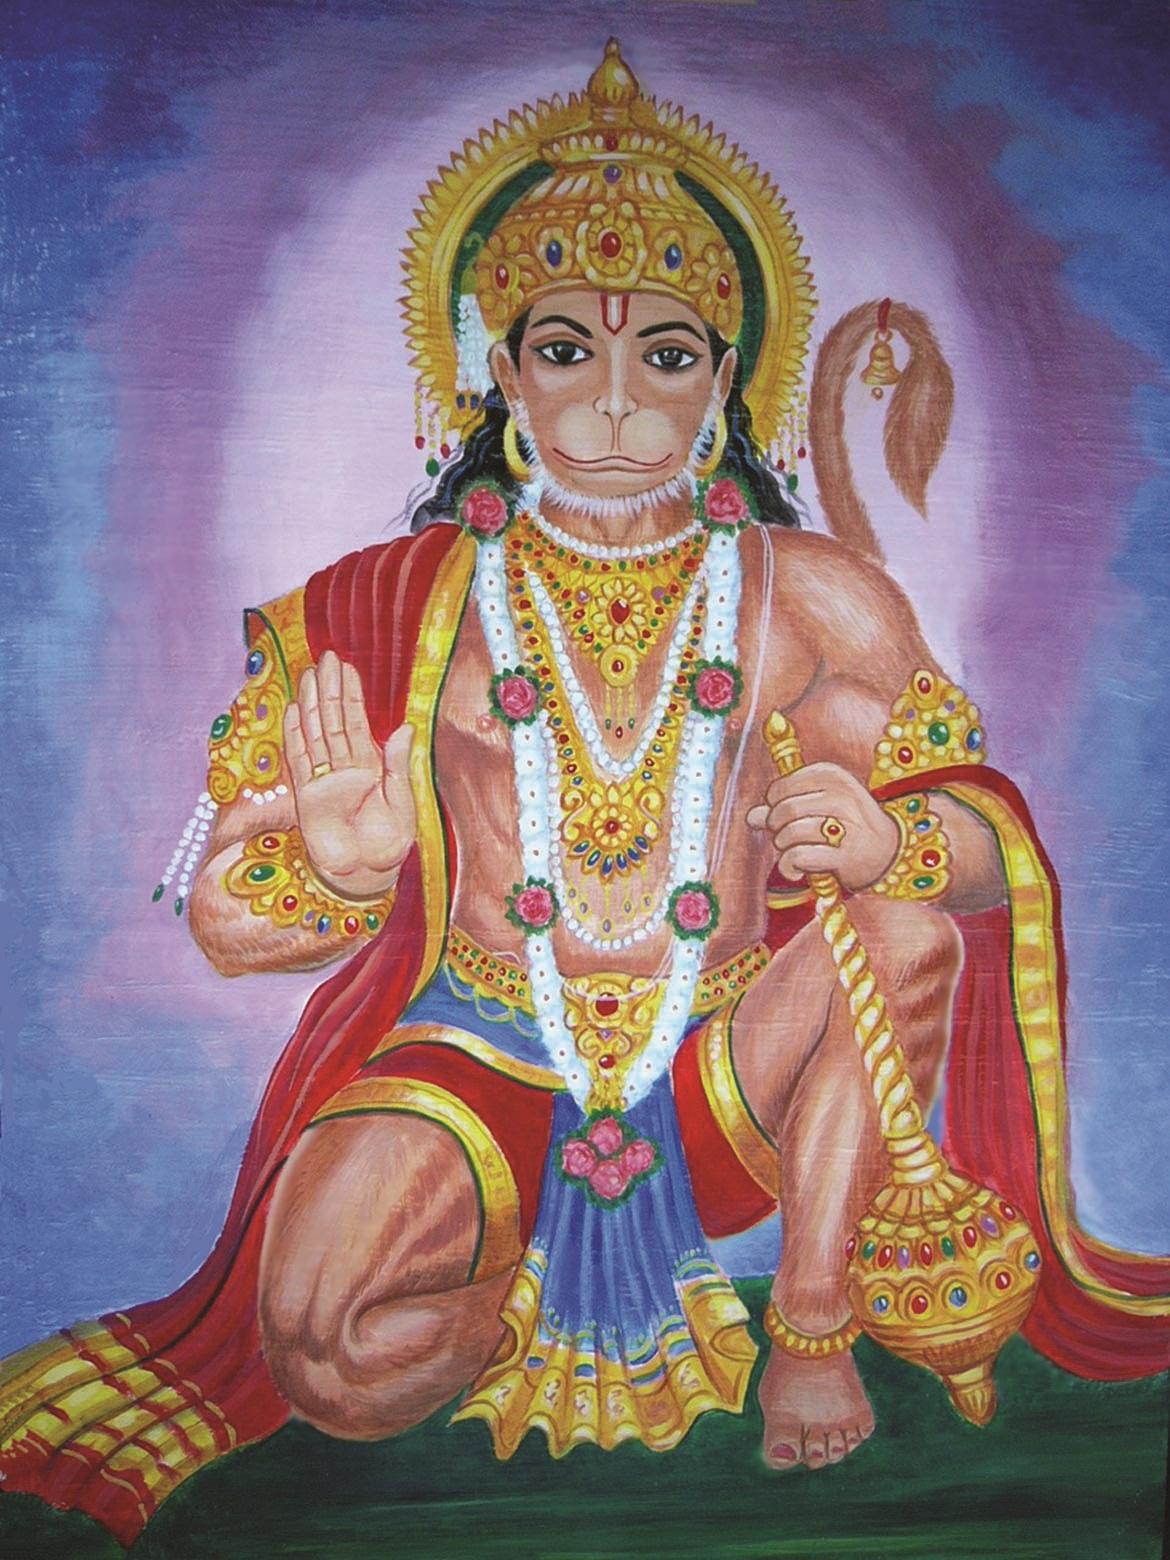 hanuman-vanara-hindu-rama-ramayana-mahabharata-betsy-shott-religious-iconography